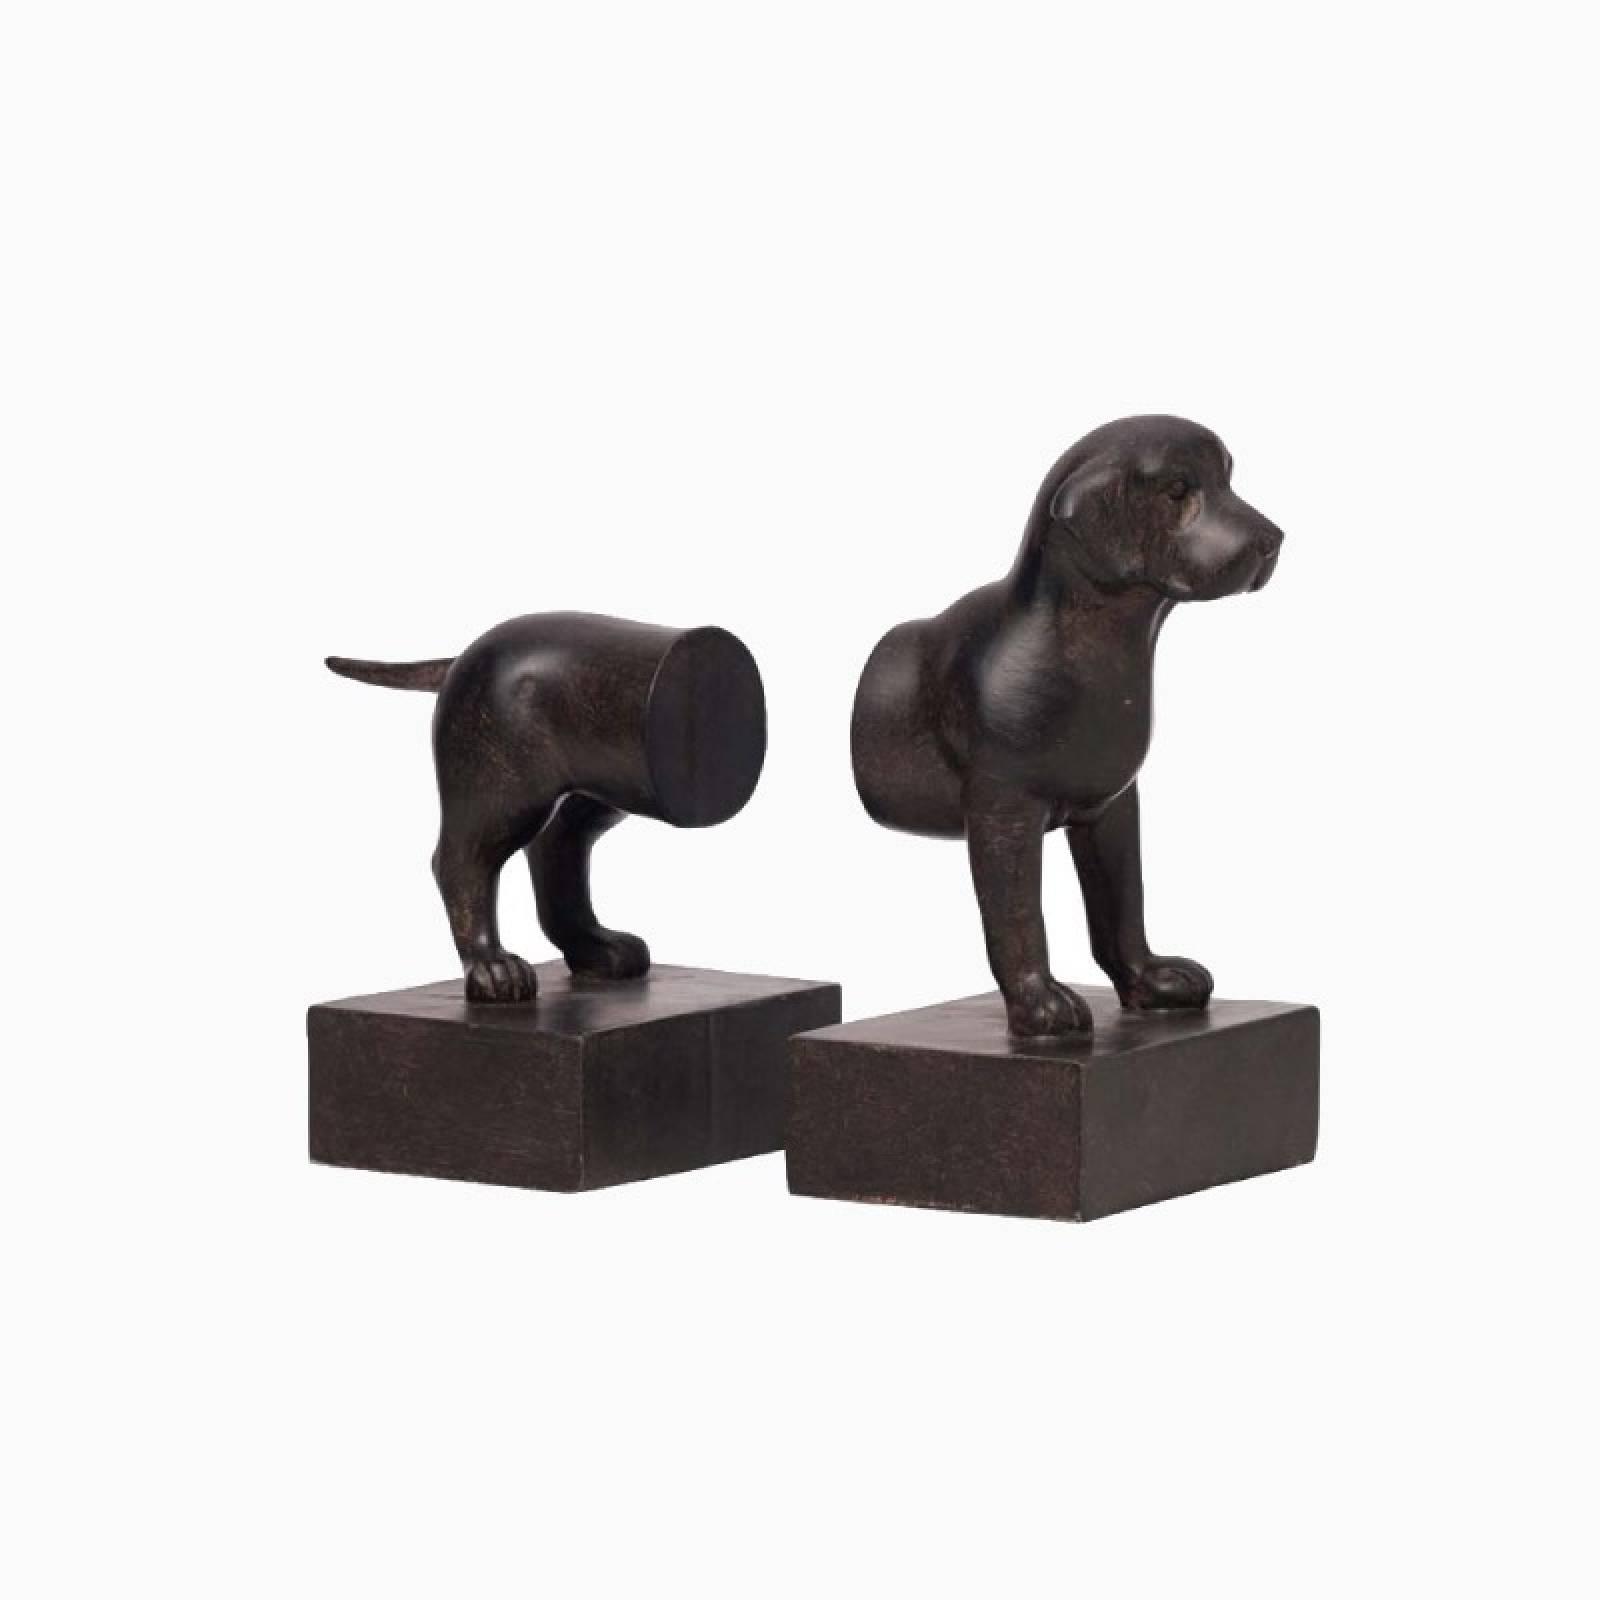 Beagle Dog Bookends